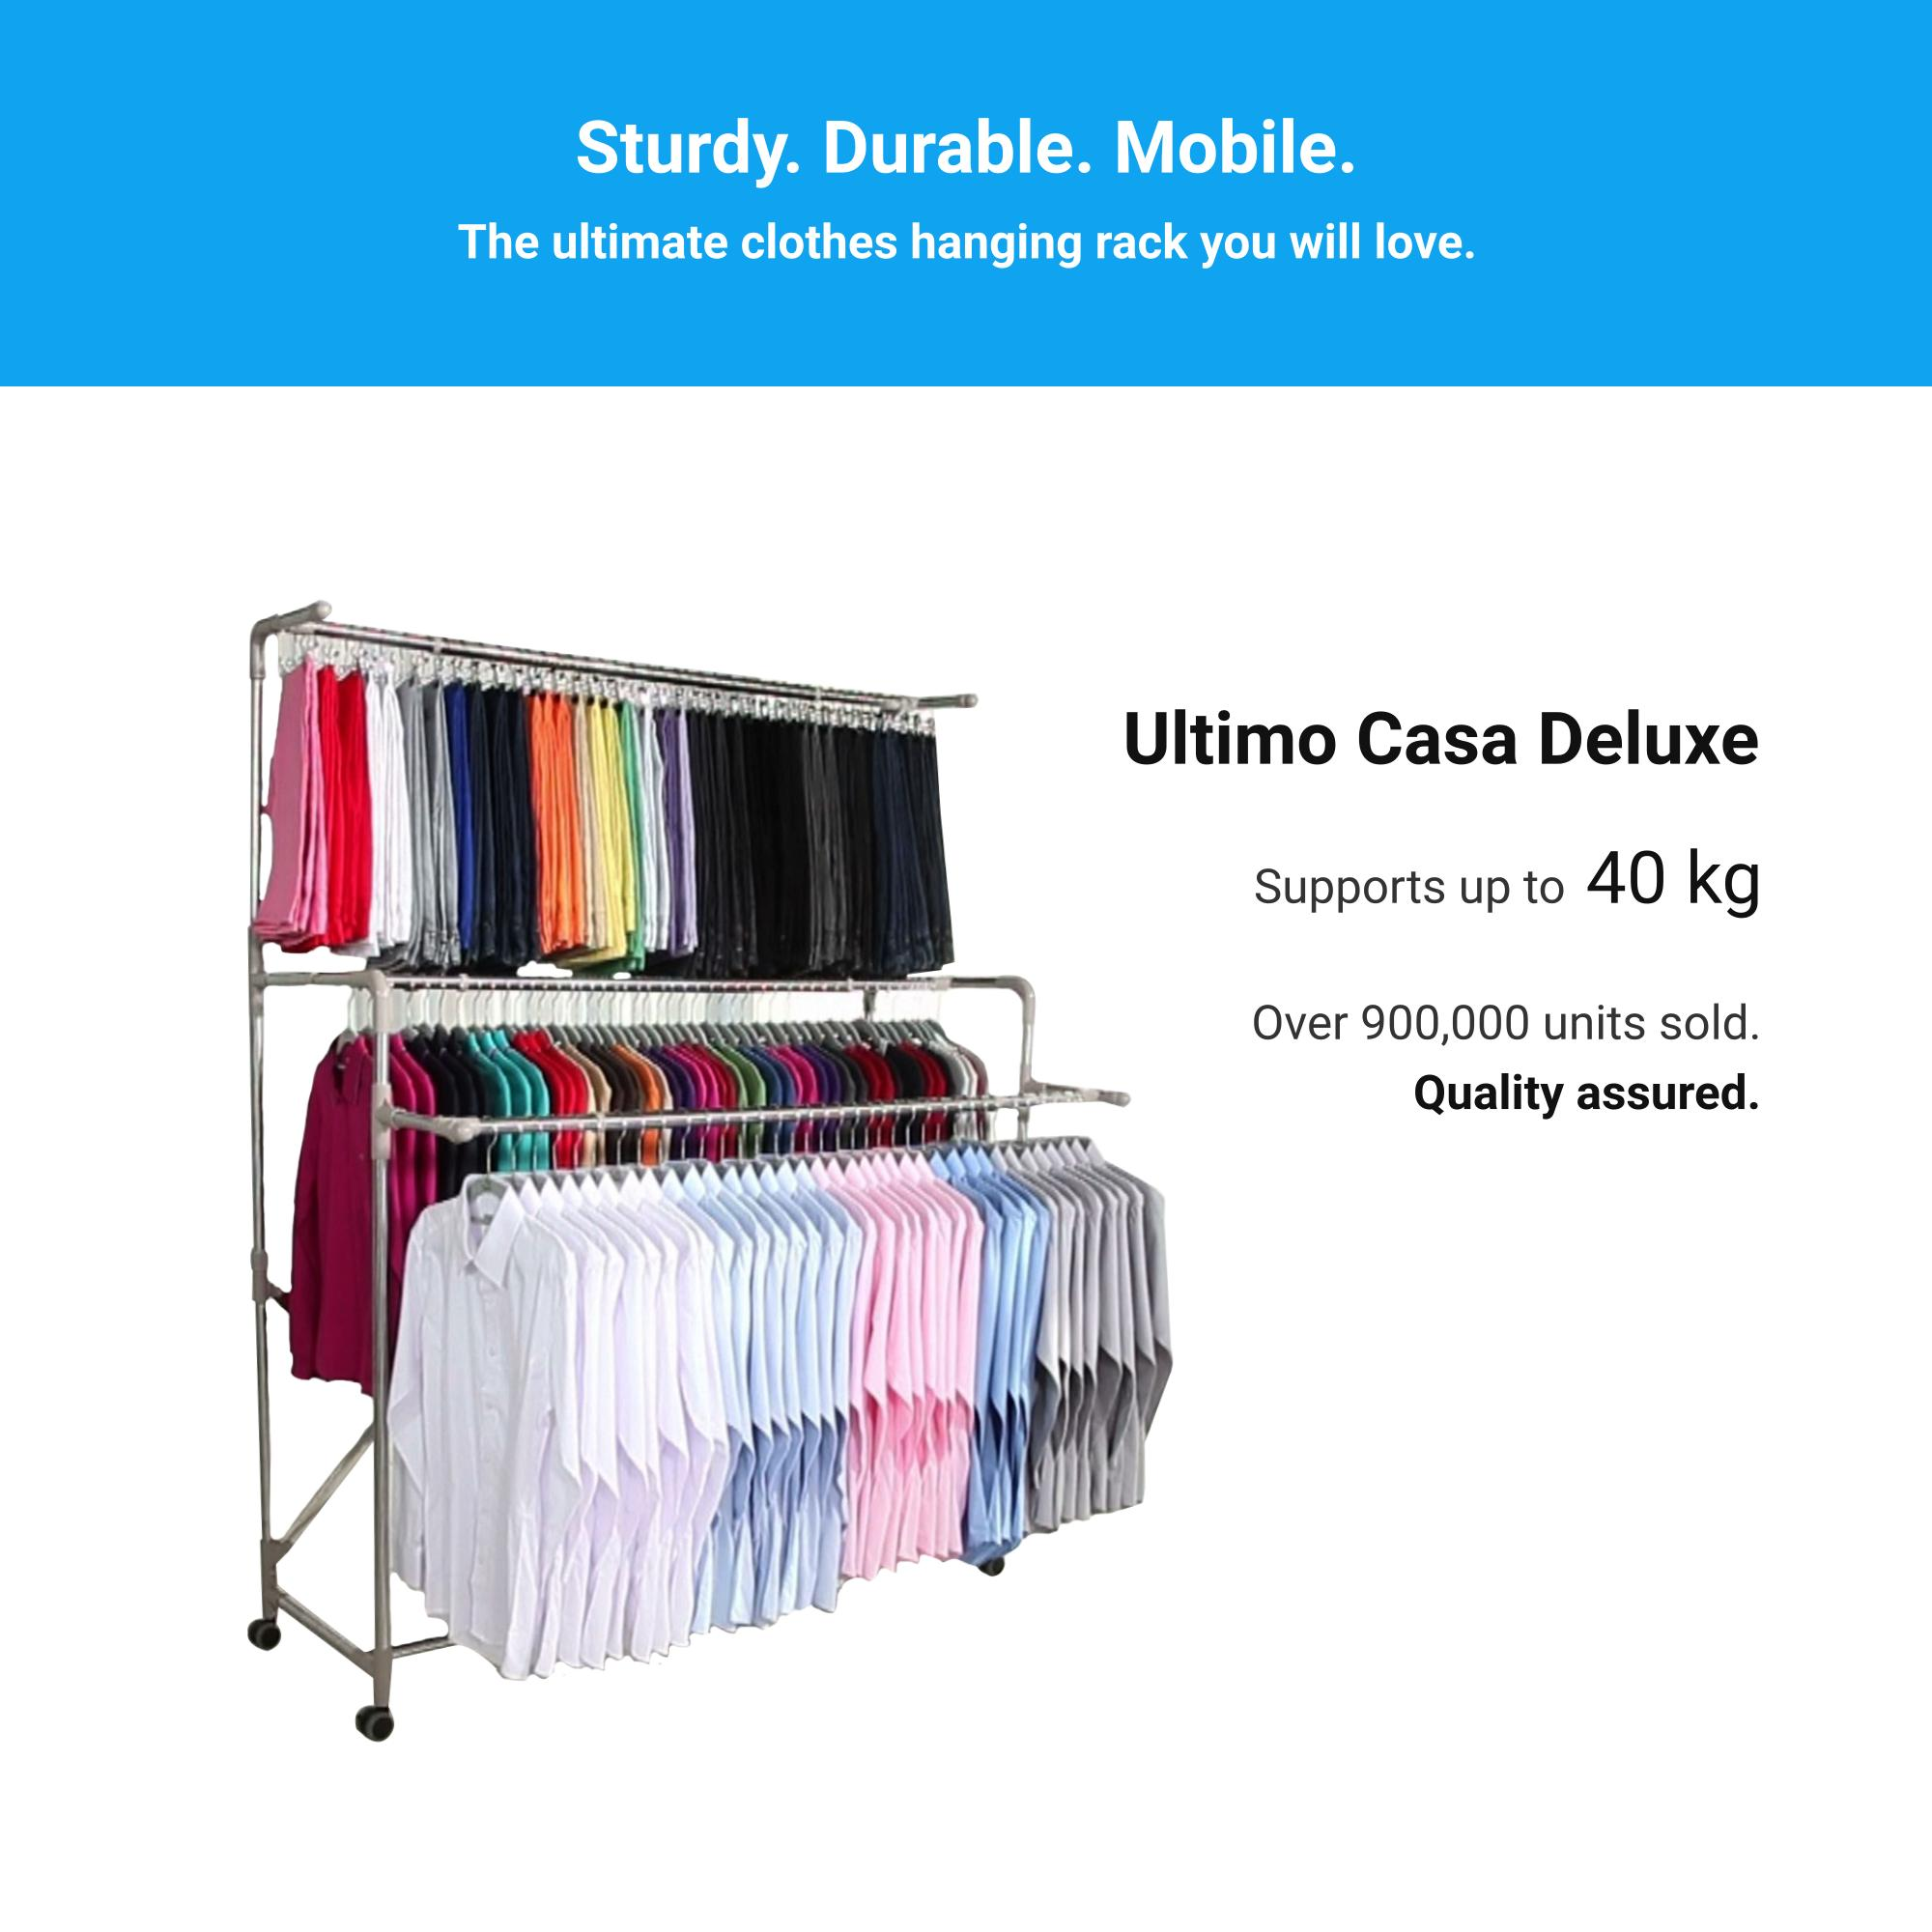 Buy Drying Racks Online Laundry Standing Hanger Multifunction Stand Jml Ultimo Casa Deluxe Clothes Hanging Rack Adjustable Stainless Steel